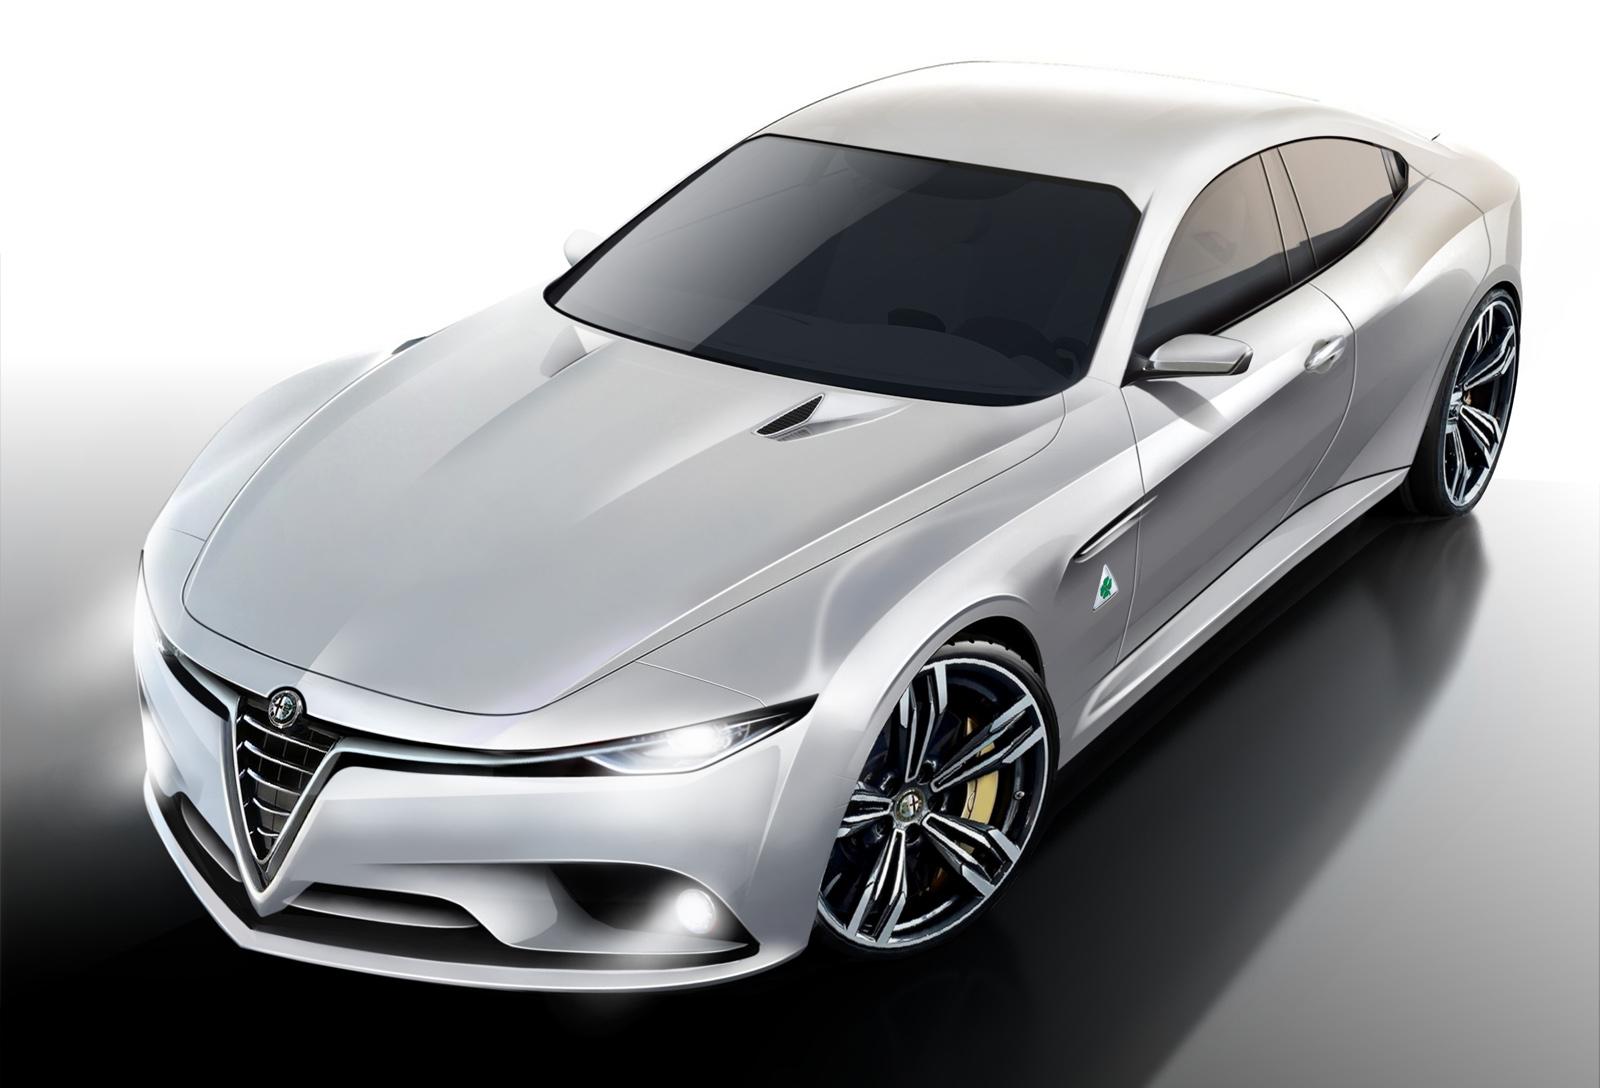 2015 Alfa Romeo Giulia rendering